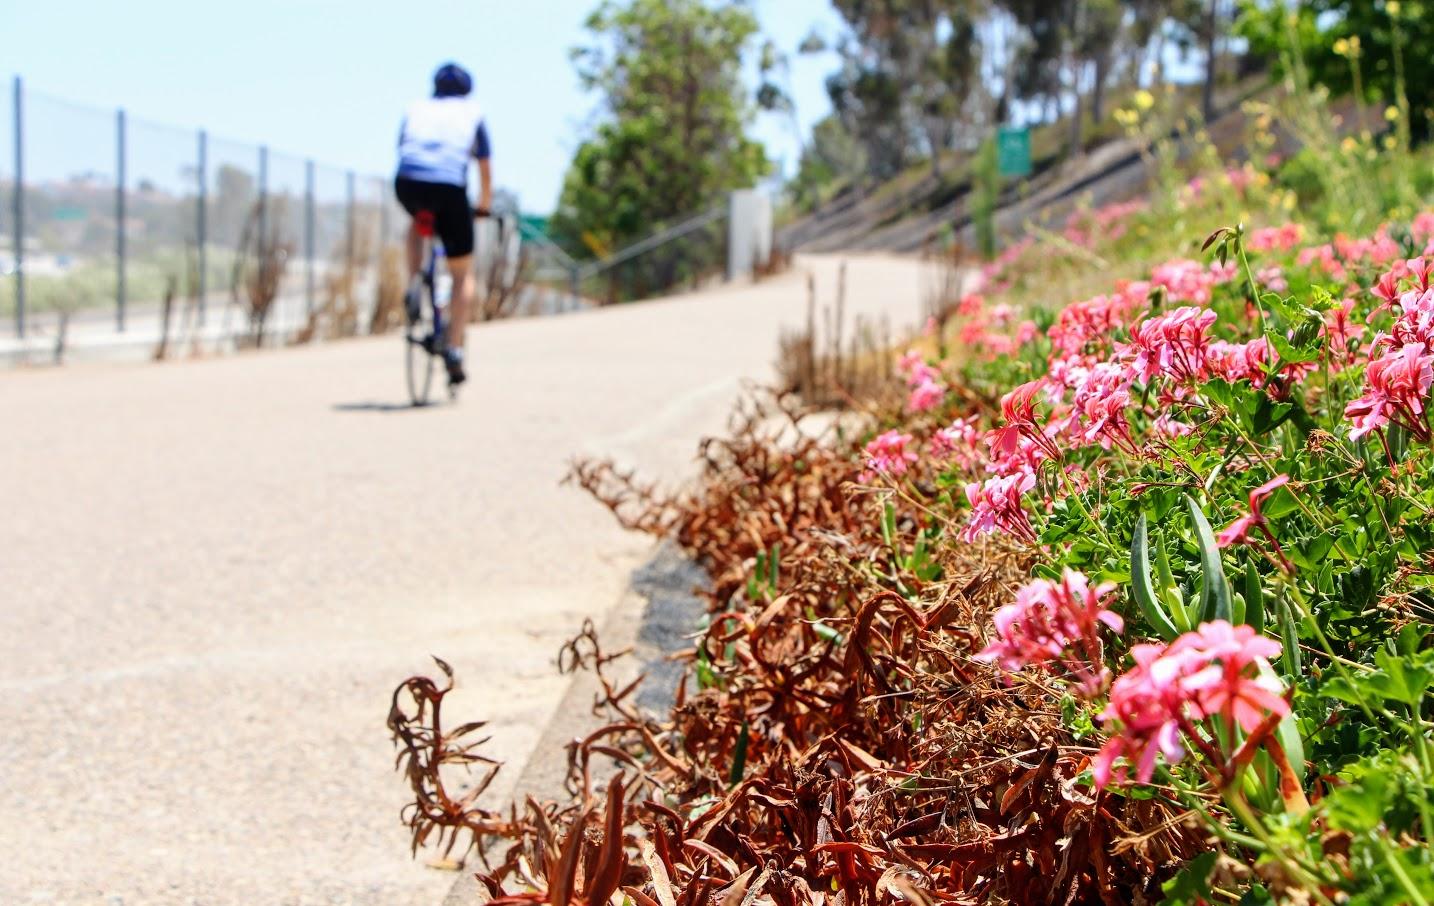 highway-56-bike-path-6